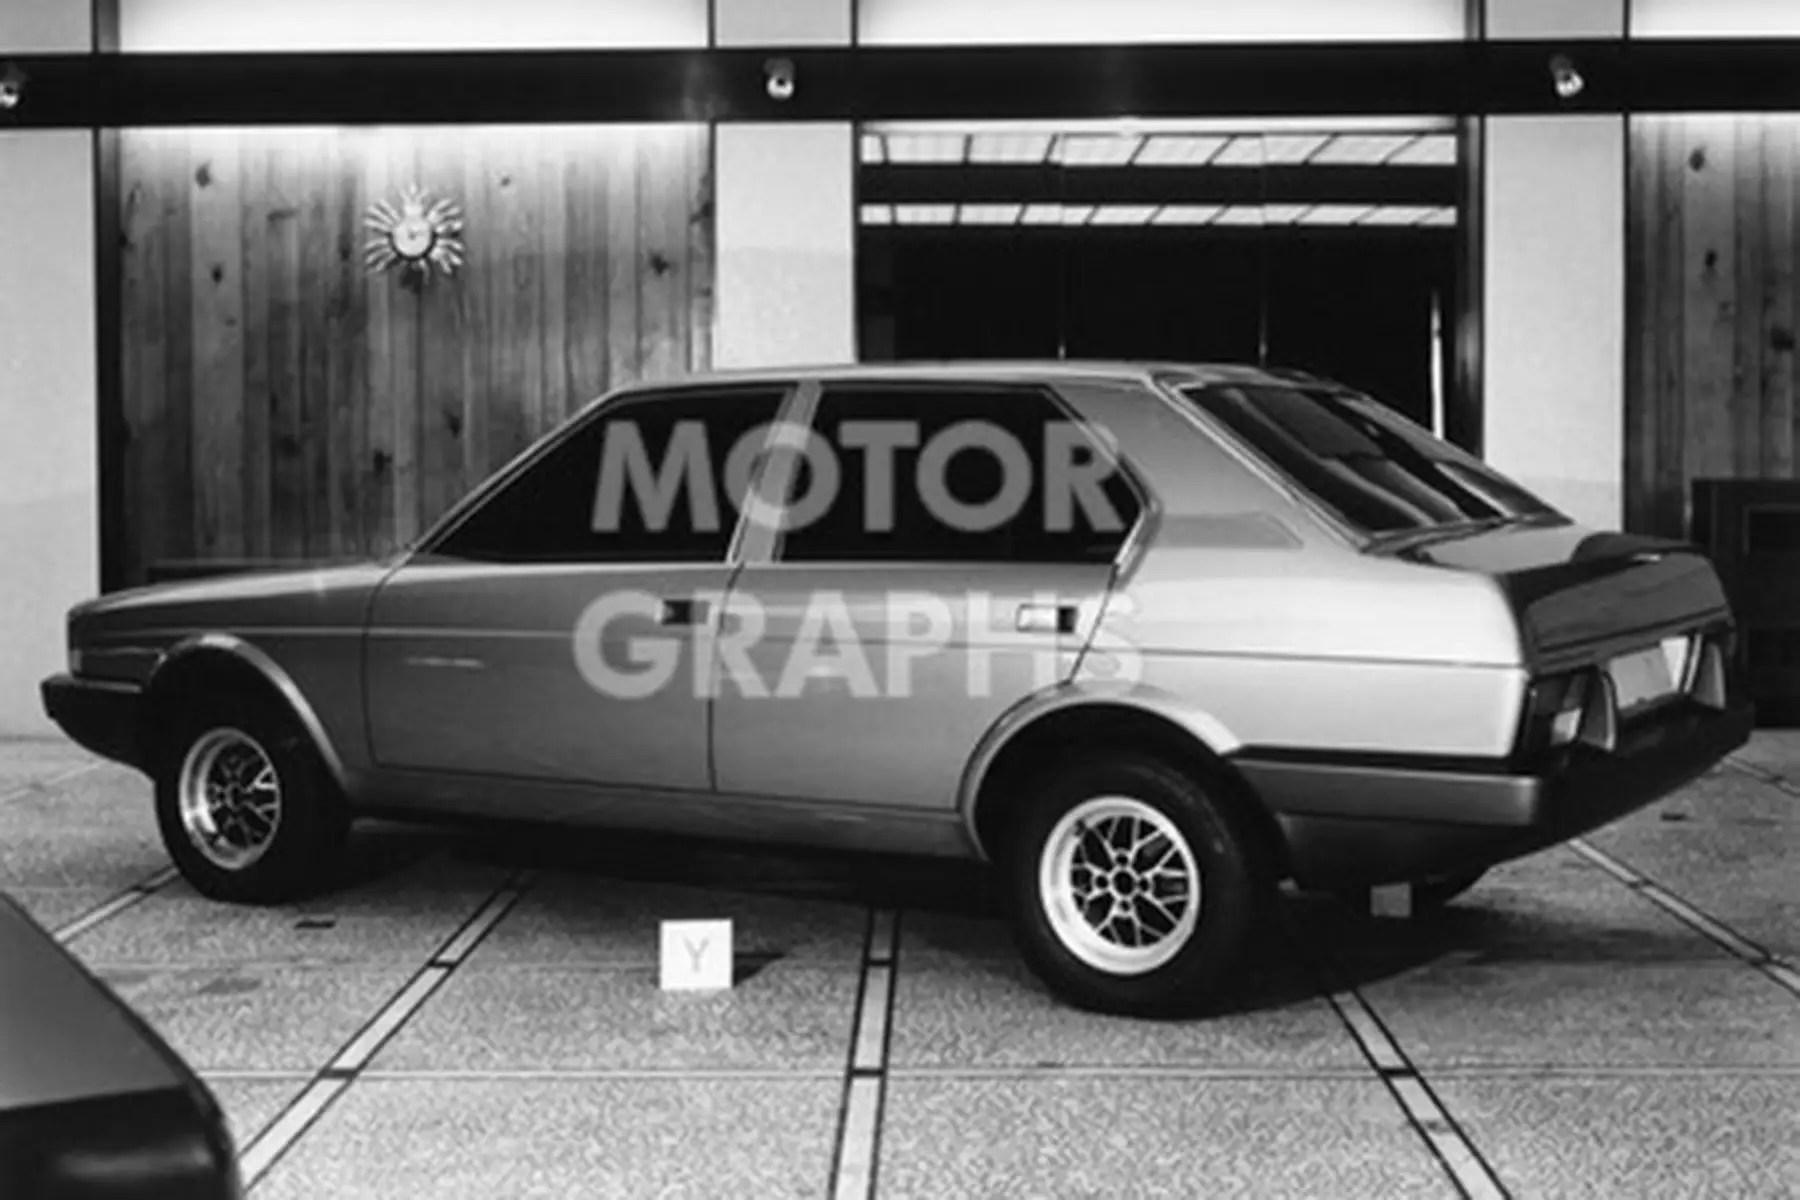 British Leyland Jaguar Triumph MG sign ...Rare and Large